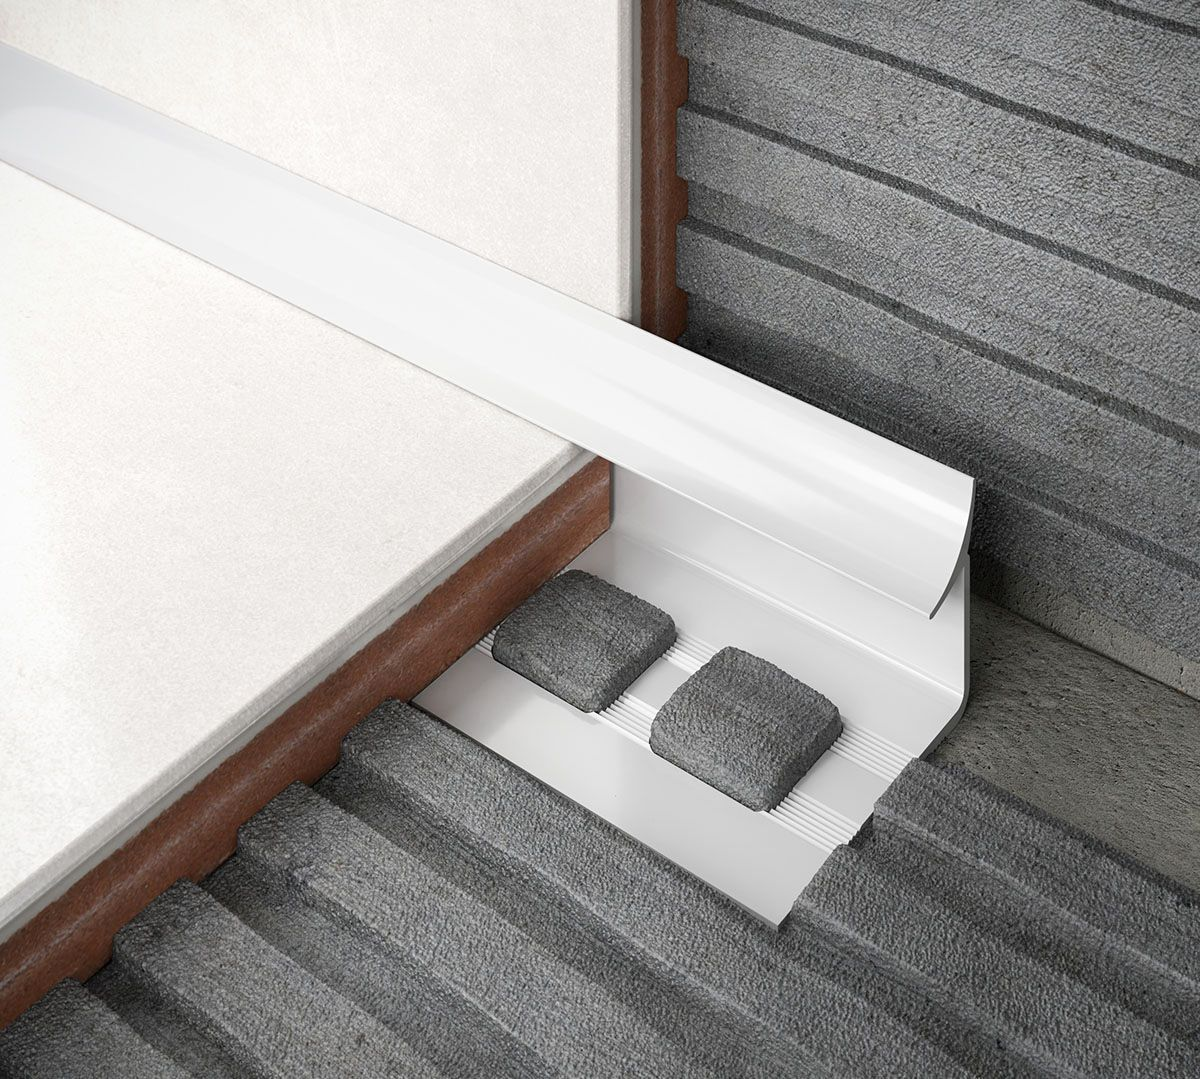 diall white pvc round tiling trim 6mm